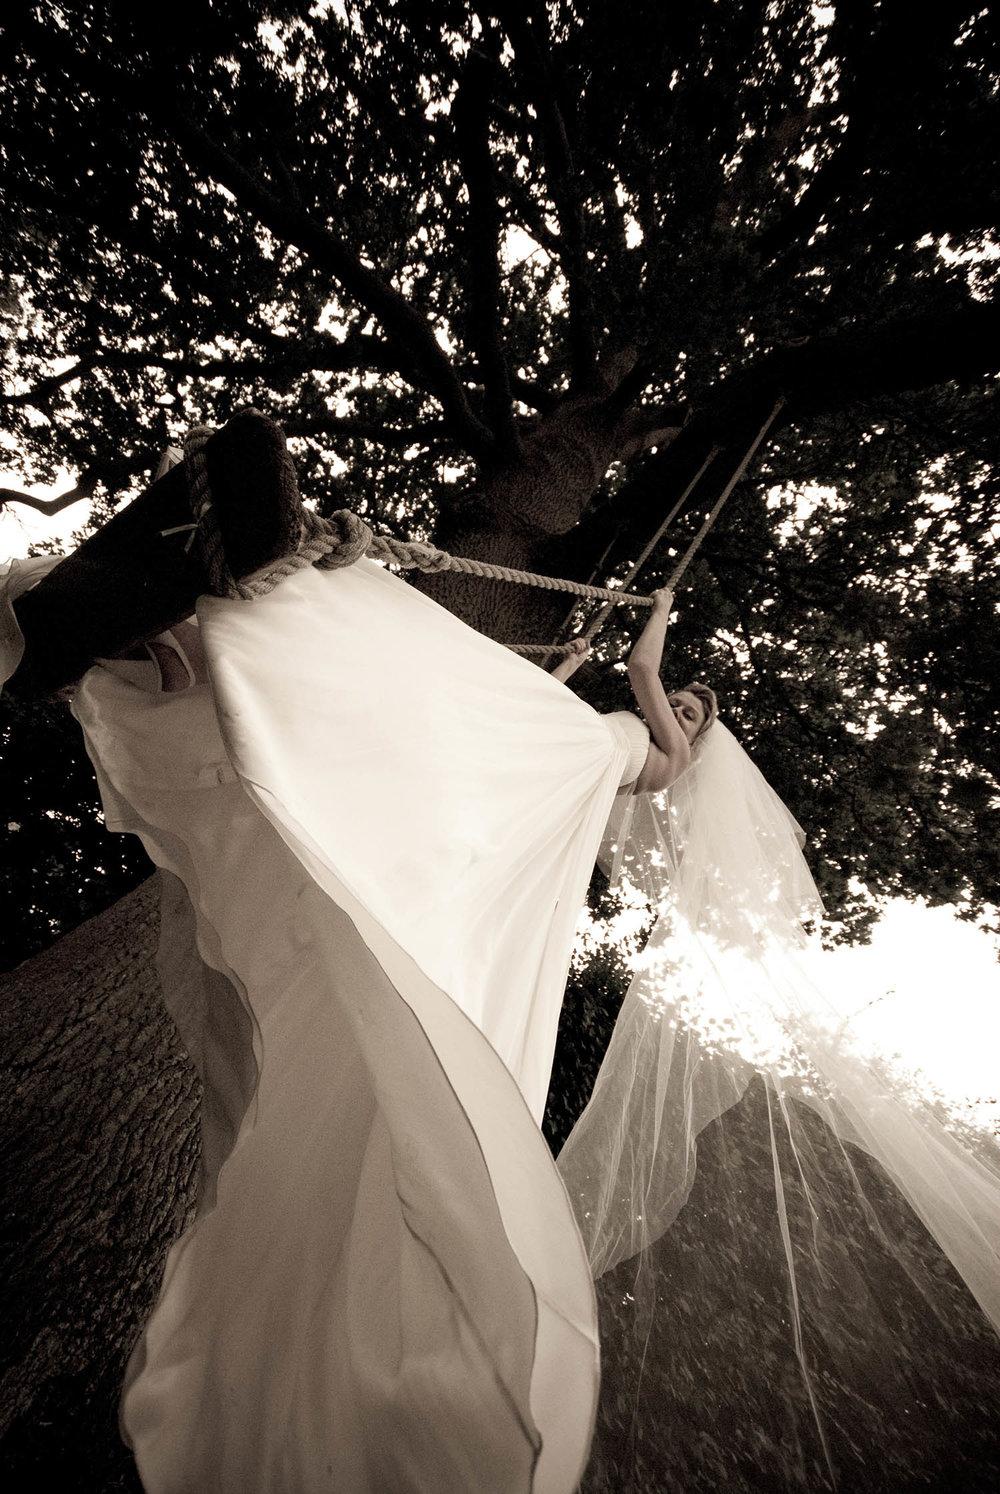 JMA-PHOTOGRAPHY-WEDDING-YORKSHIRE-BRIDE-SWING.JPG